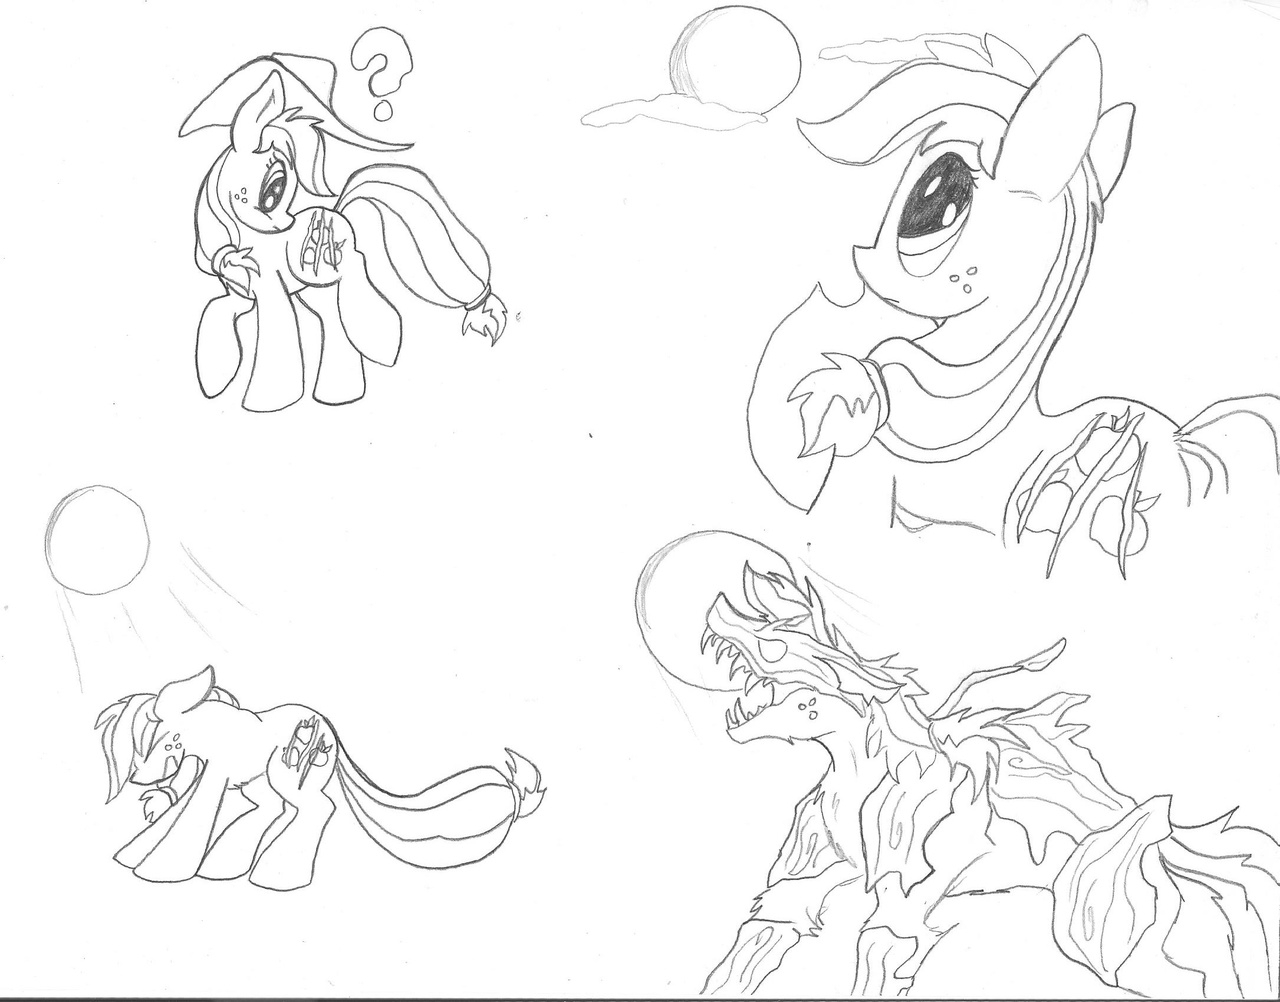 1280x1002 Pencil Sketch Pictures Of Werewolf Transformation 927336